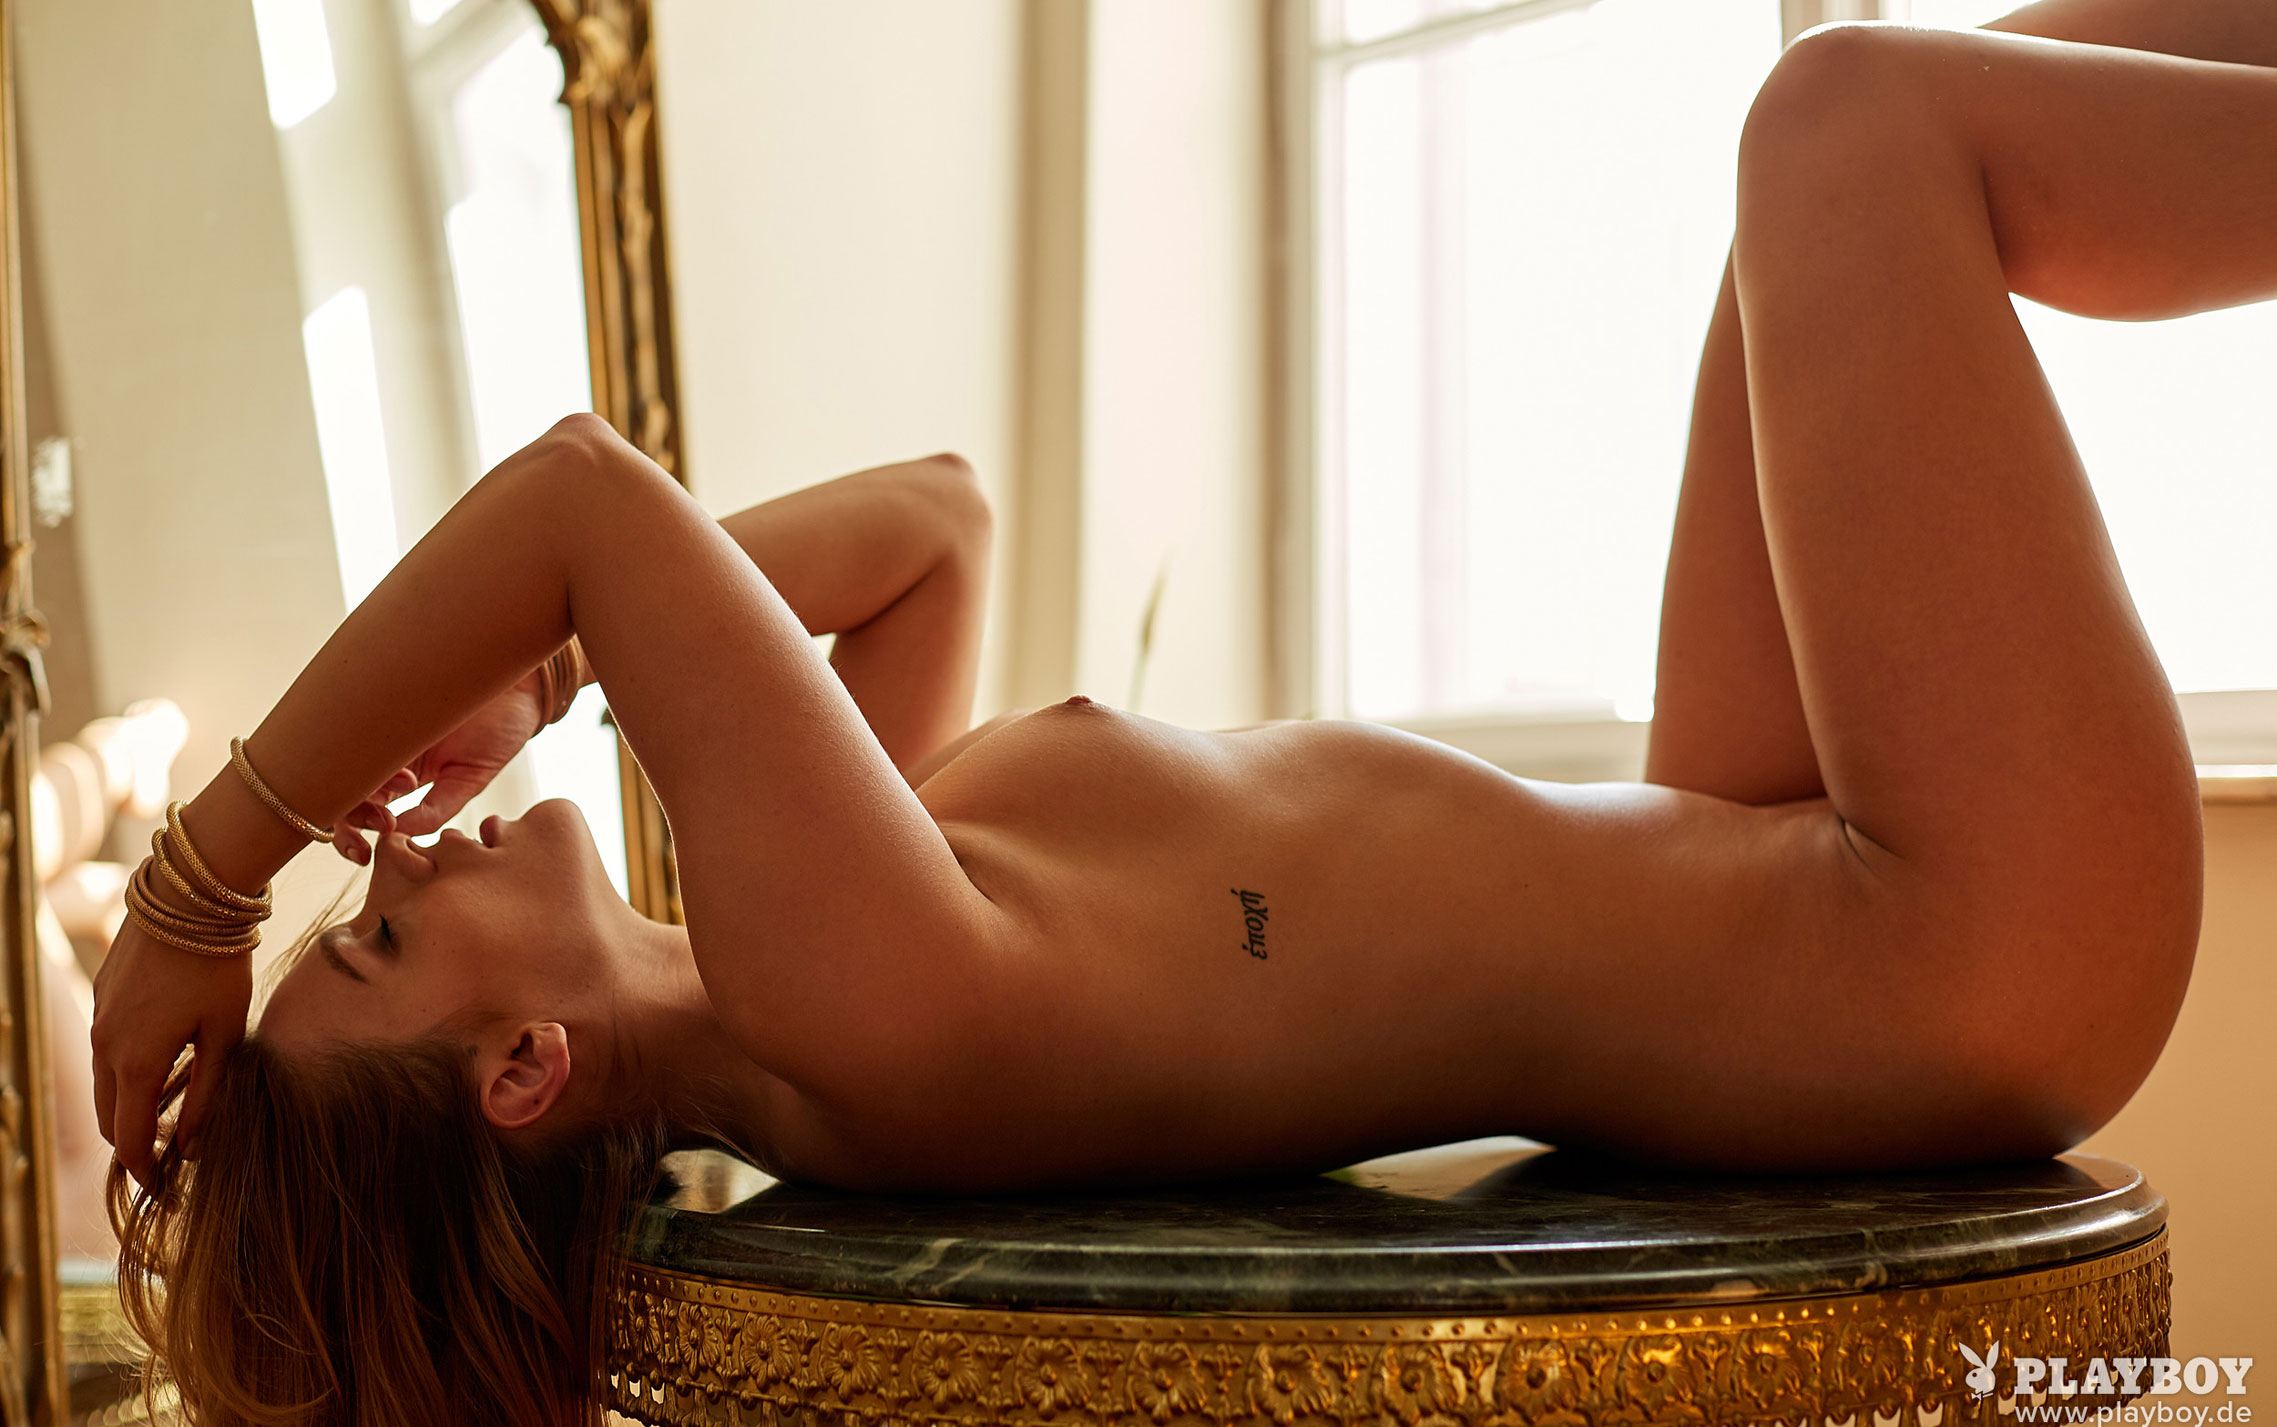 Девушка месяца Playboy Германия декабрь 2019 - Лена Беднарска / фото 09